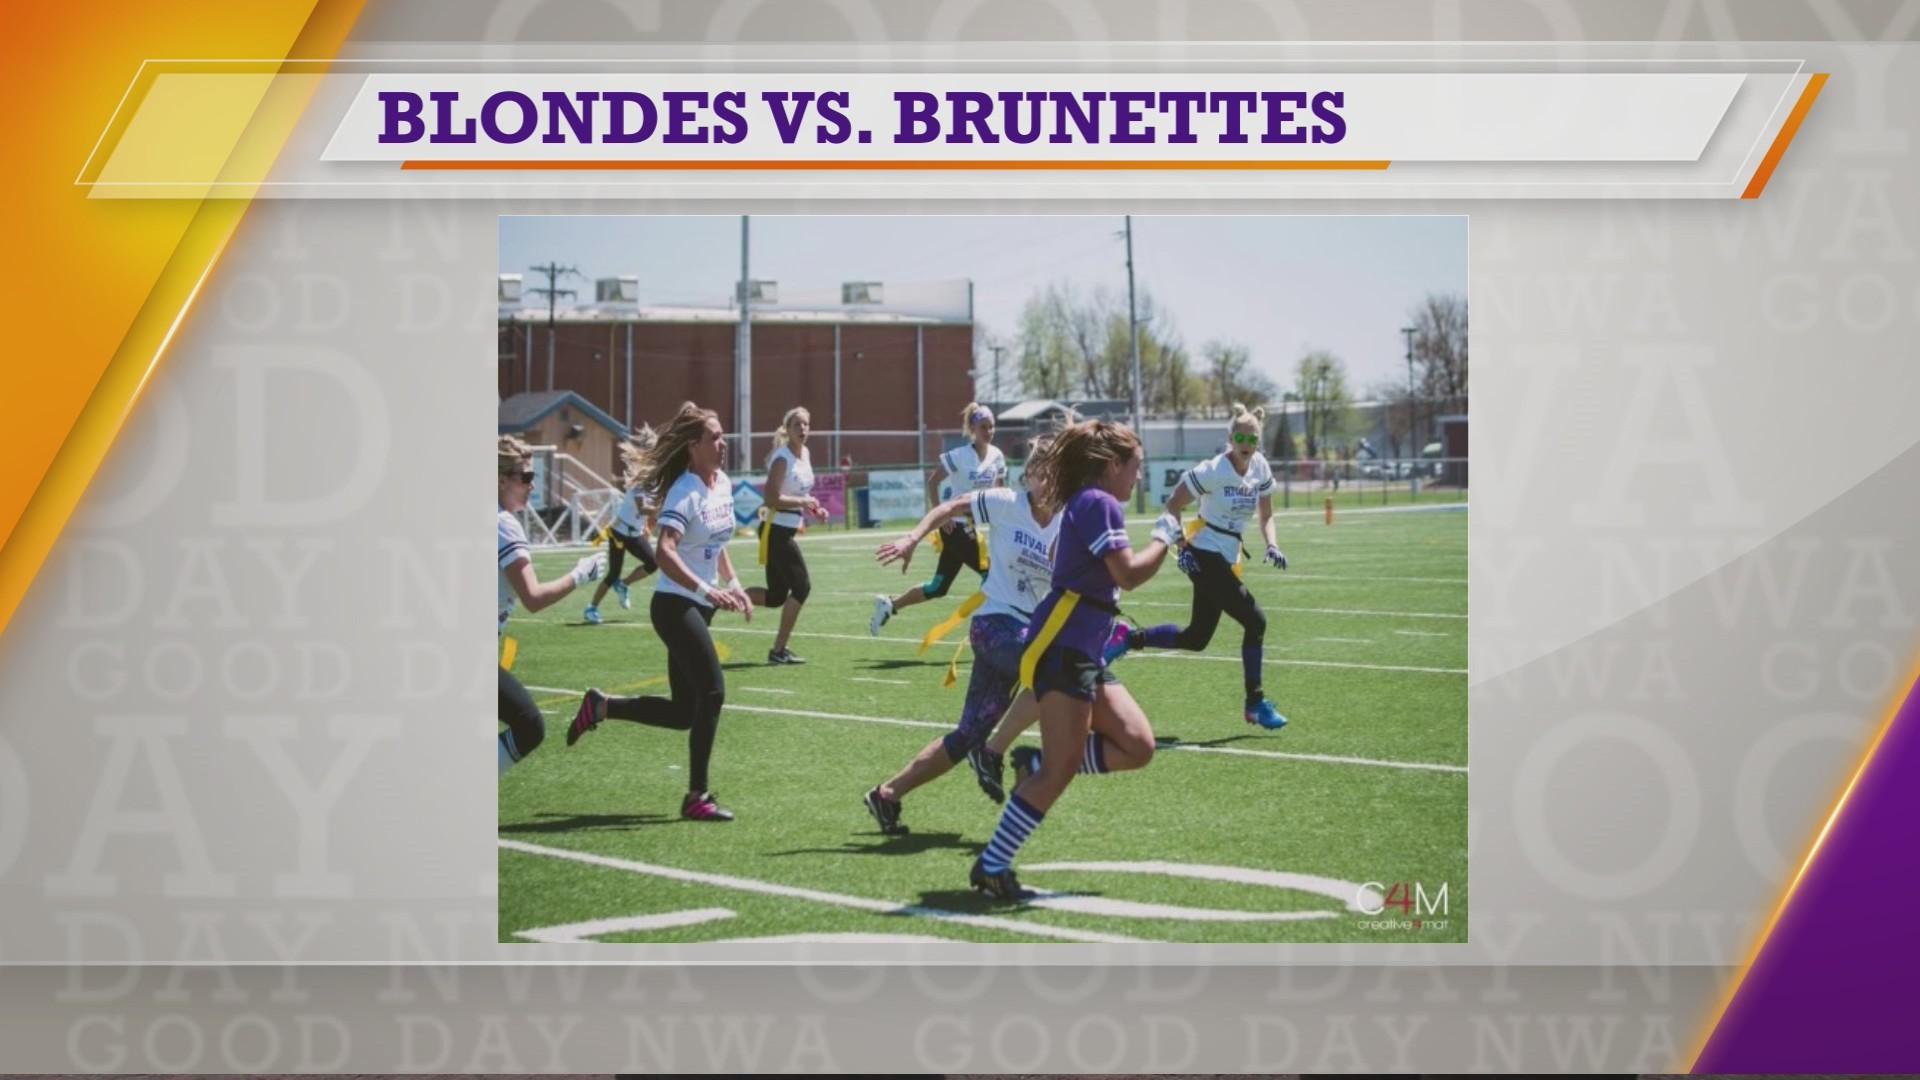 Good_Day_NWA__Blondes_vs__Brunettes_Fund_0_20190408160234